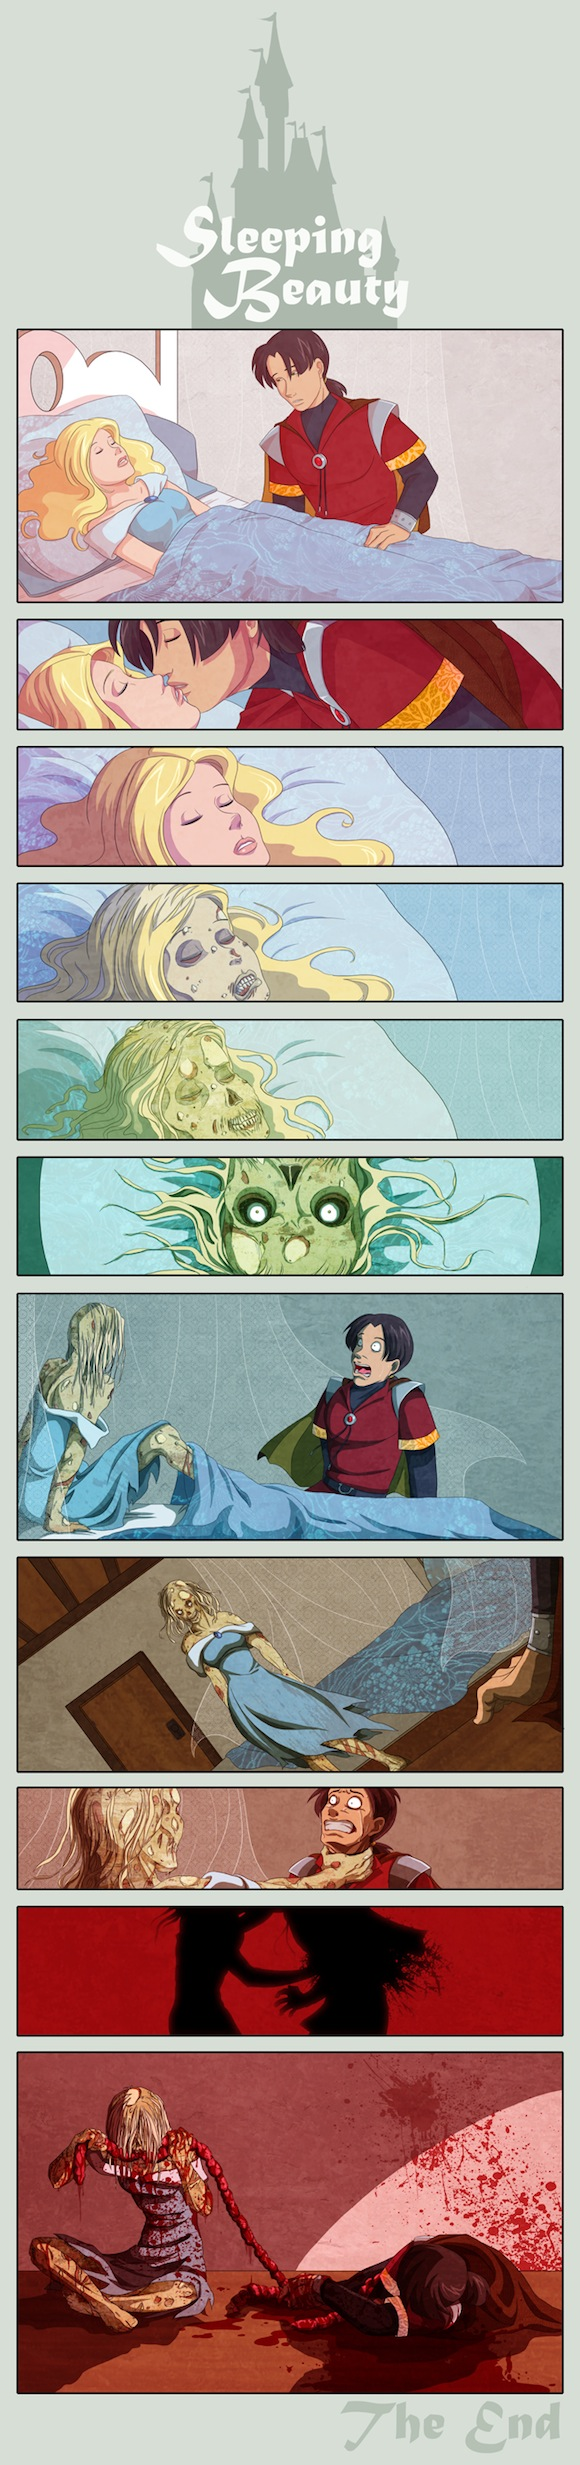 Zombie Sleeping Beauty